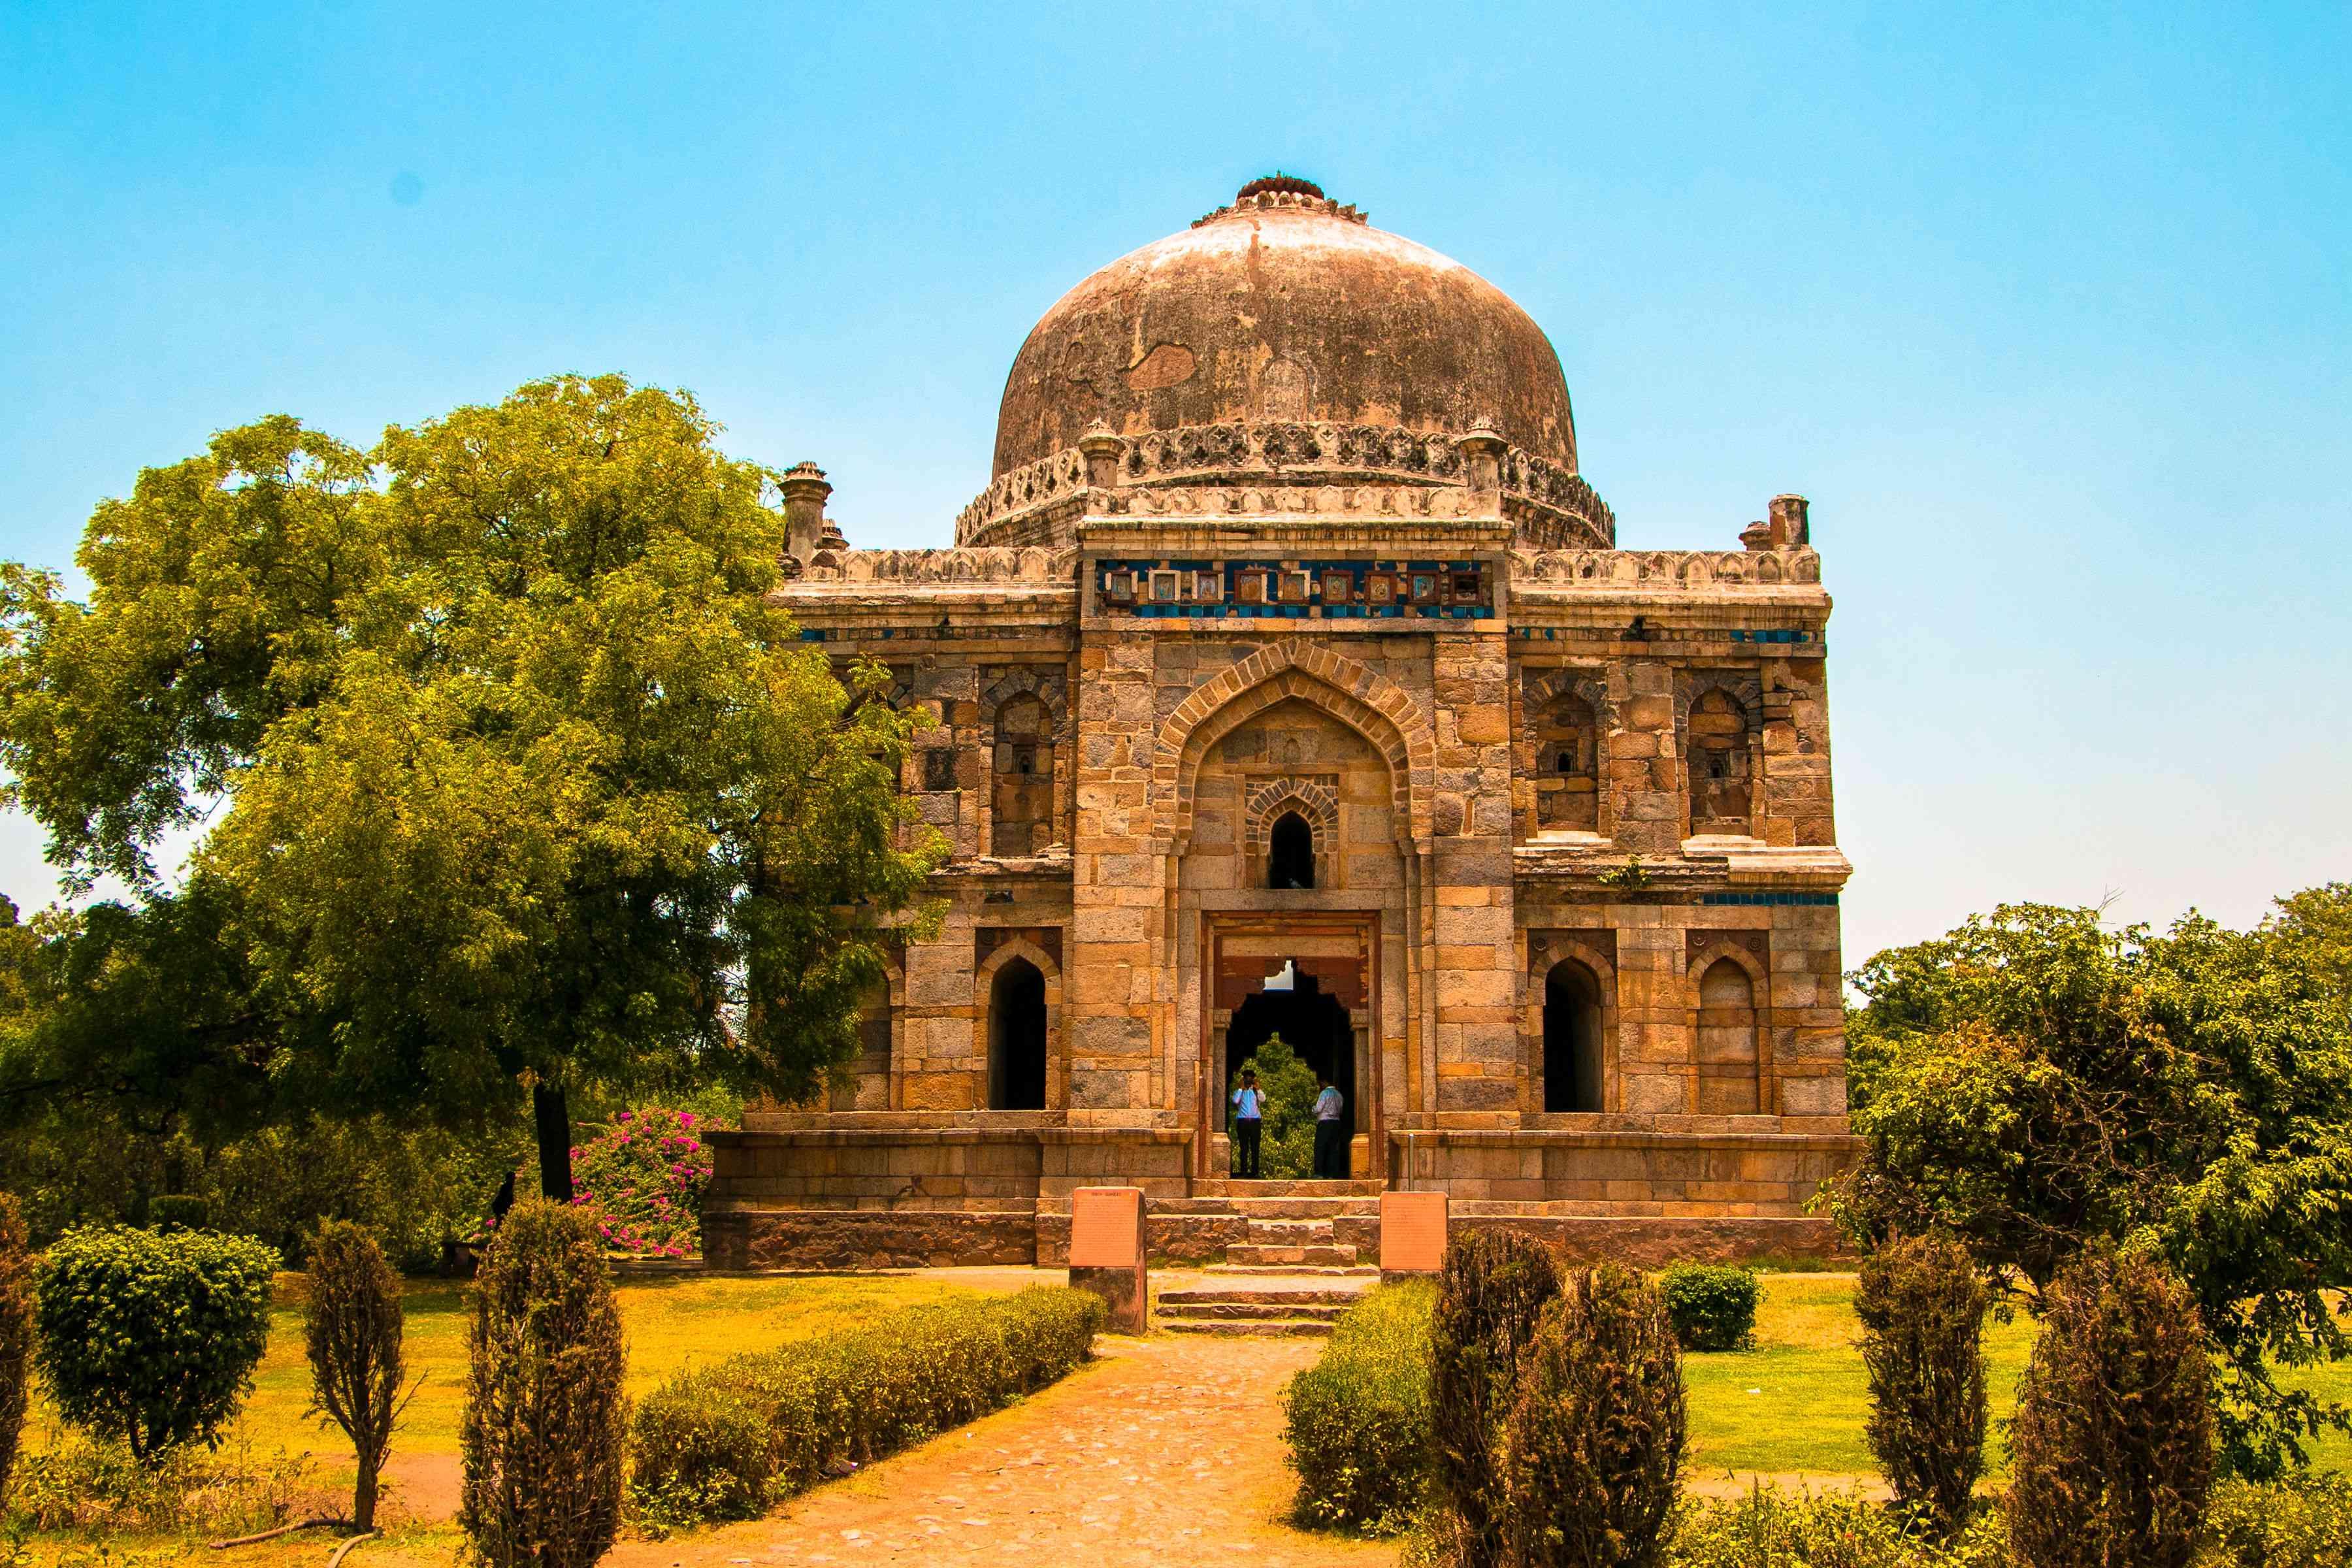 Shhesh Gumbad Tomb in Lodhi Gardens